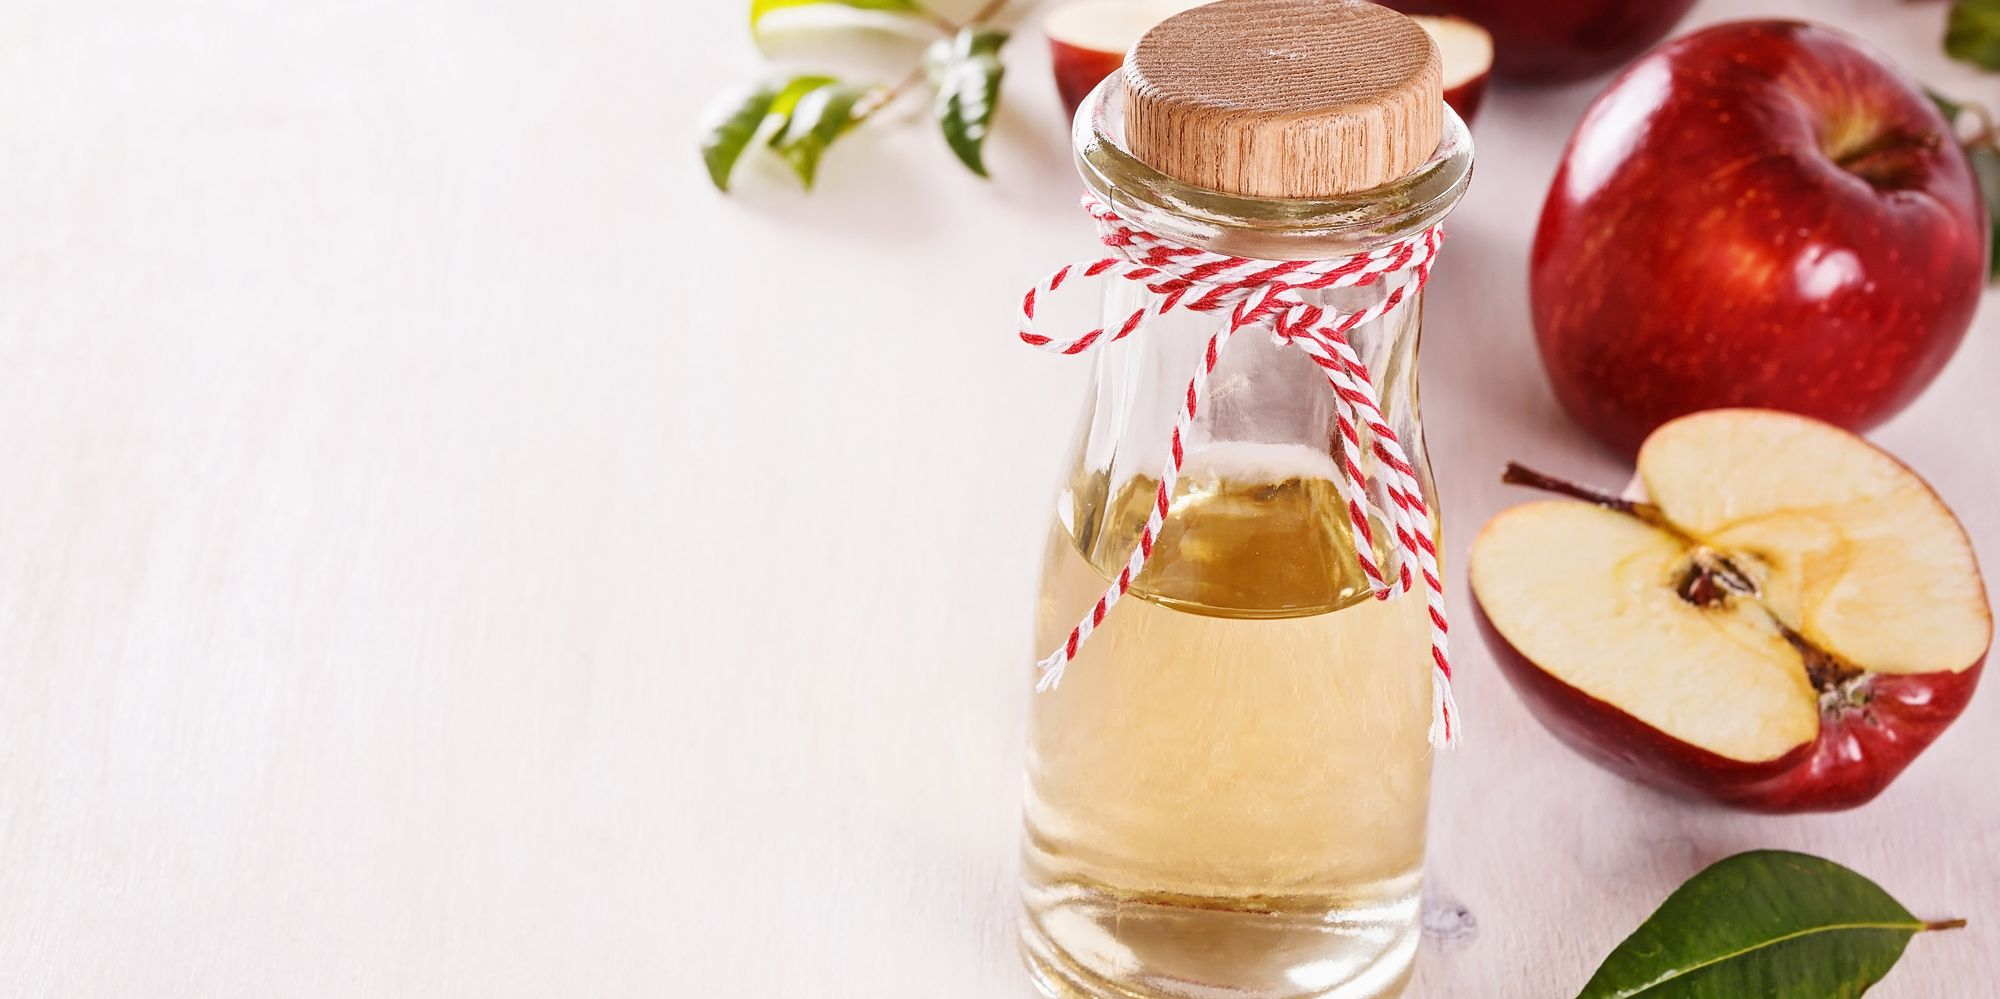 Apple Cider Vinegar: Benefits, Uses and Diet | HuffPost UK